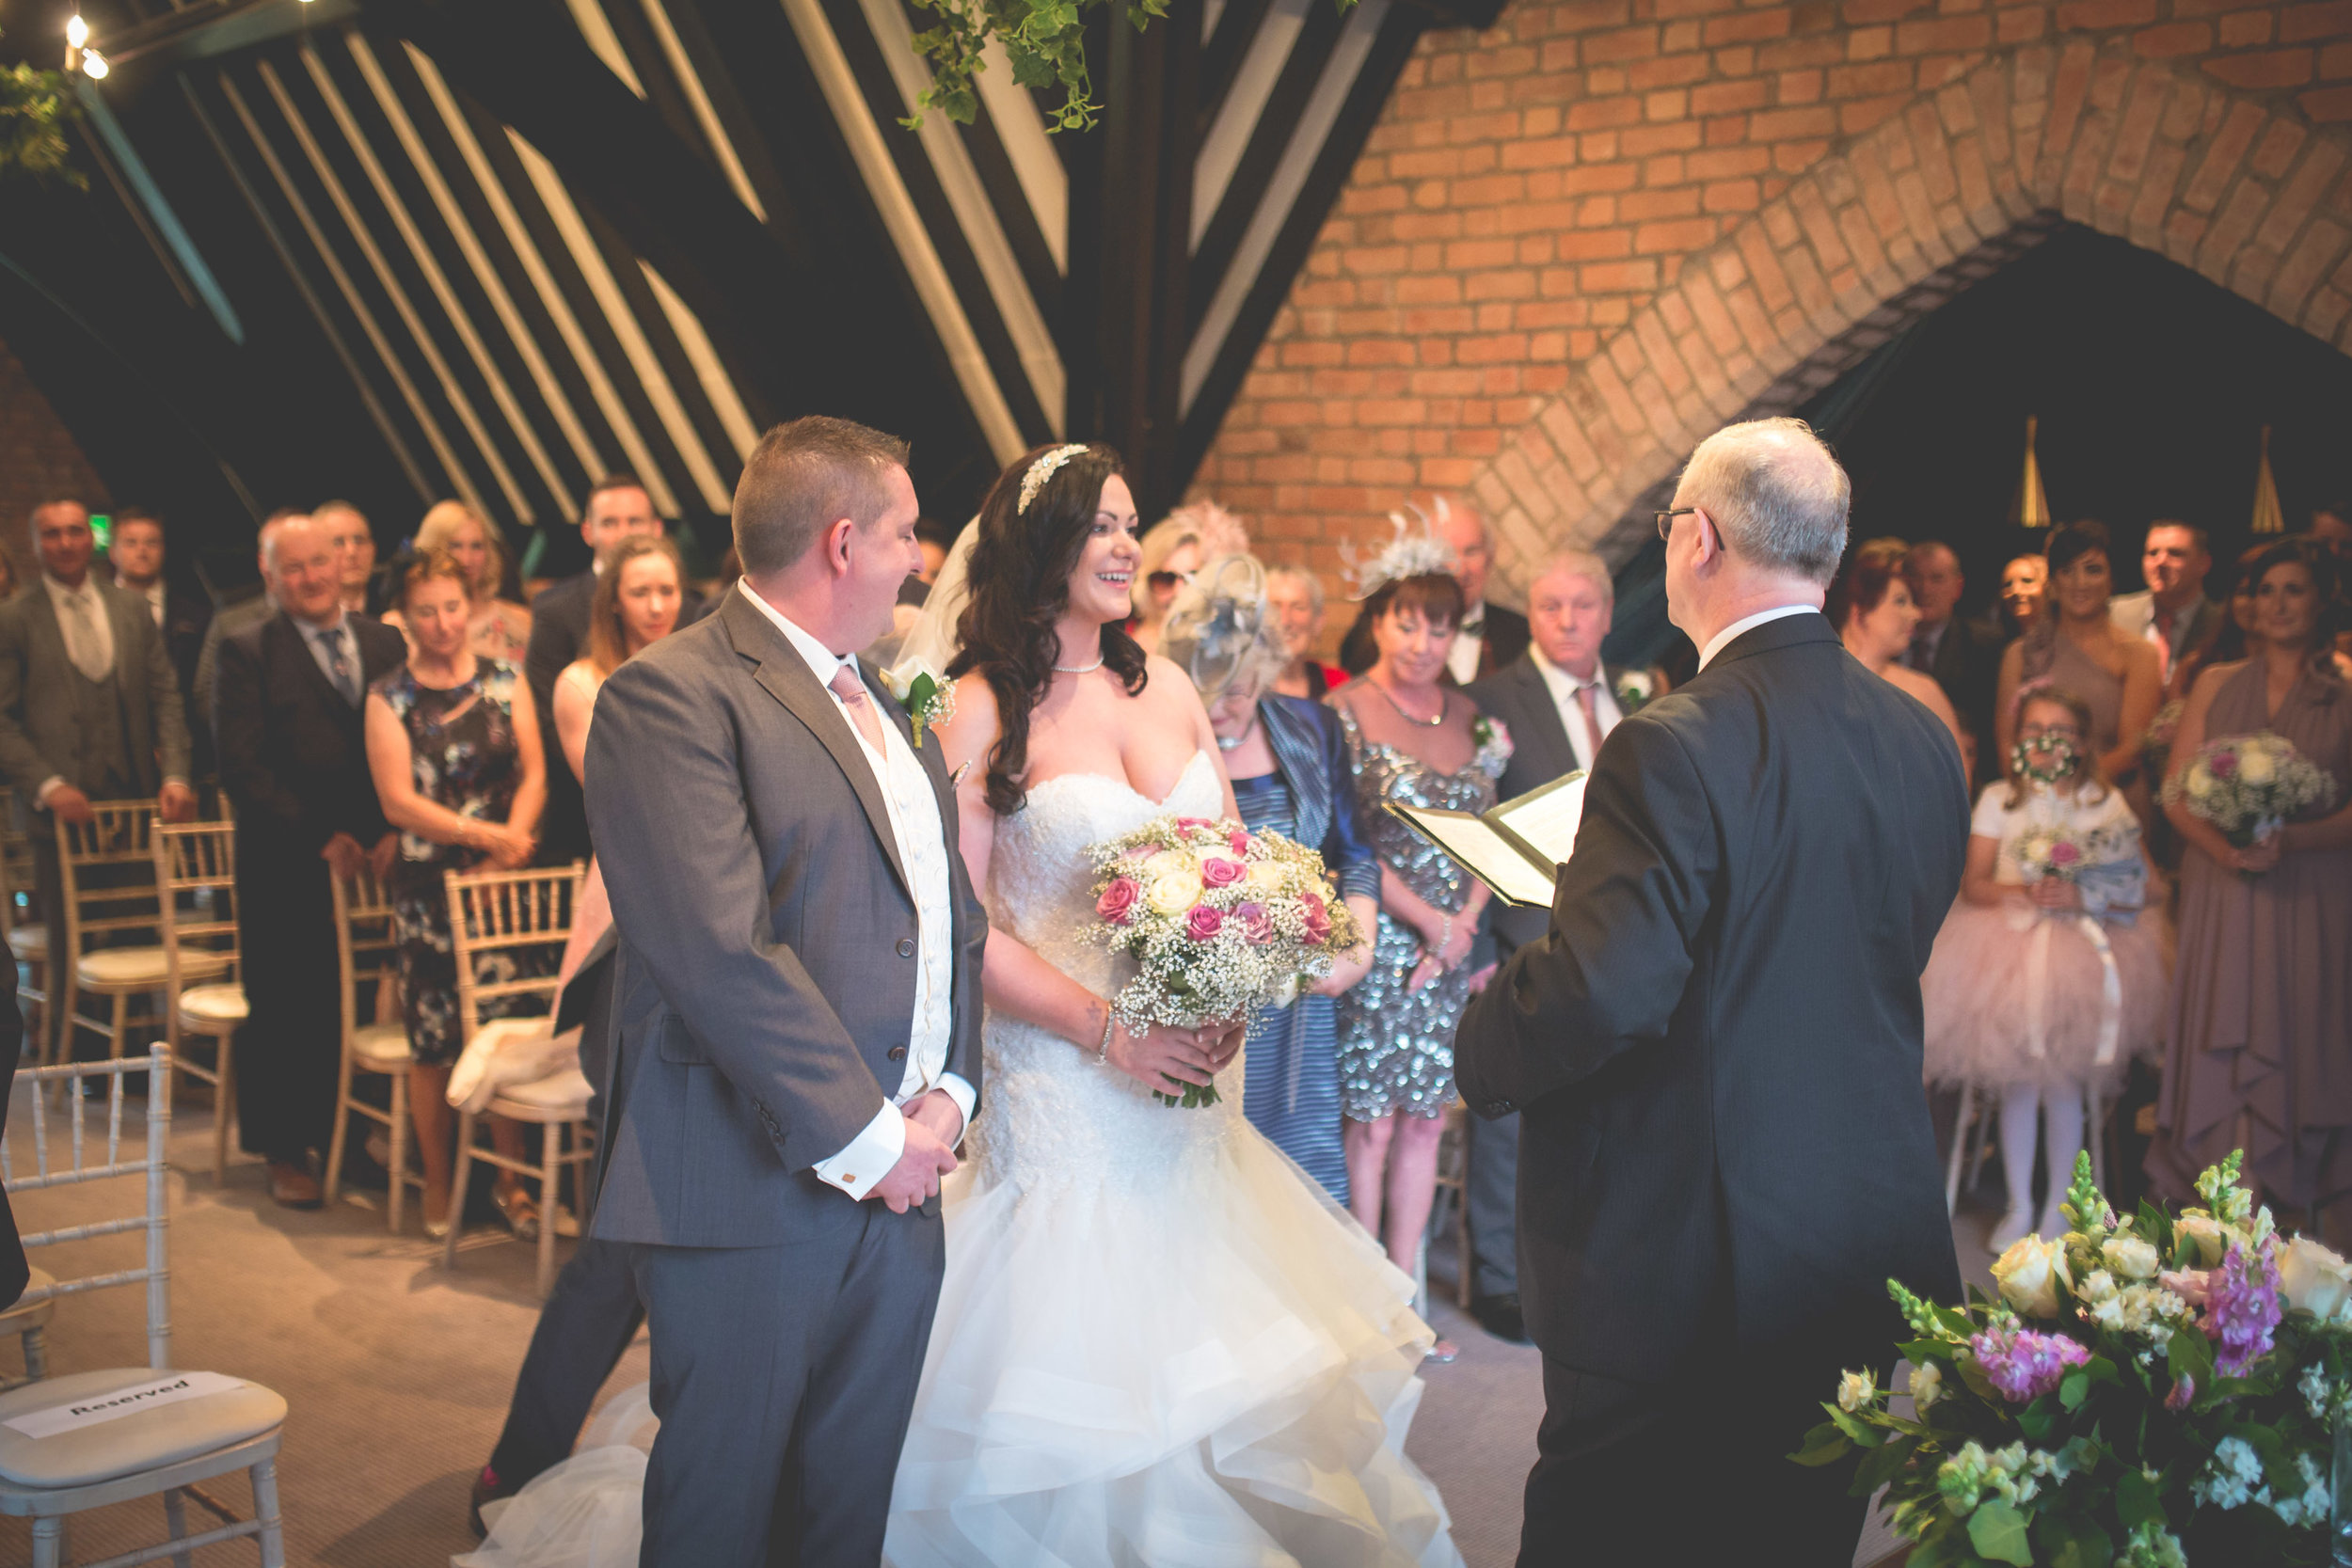 Helena & Terence - Ceremony-27.jpg